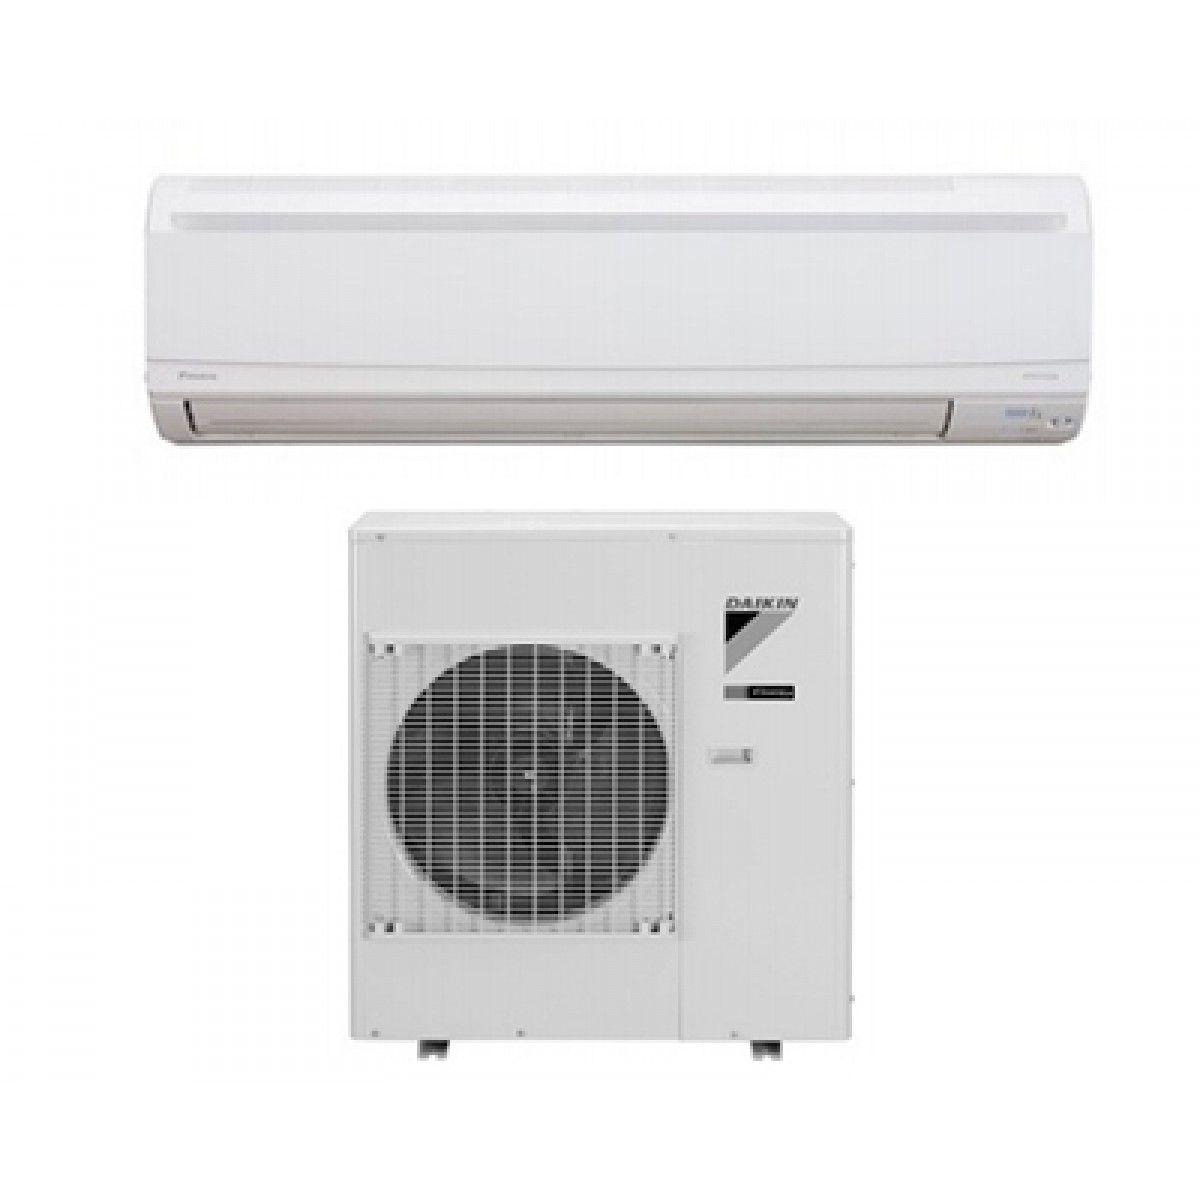 Daikin Skyair 18k Btu 18 6 Seer Cooling Only System With